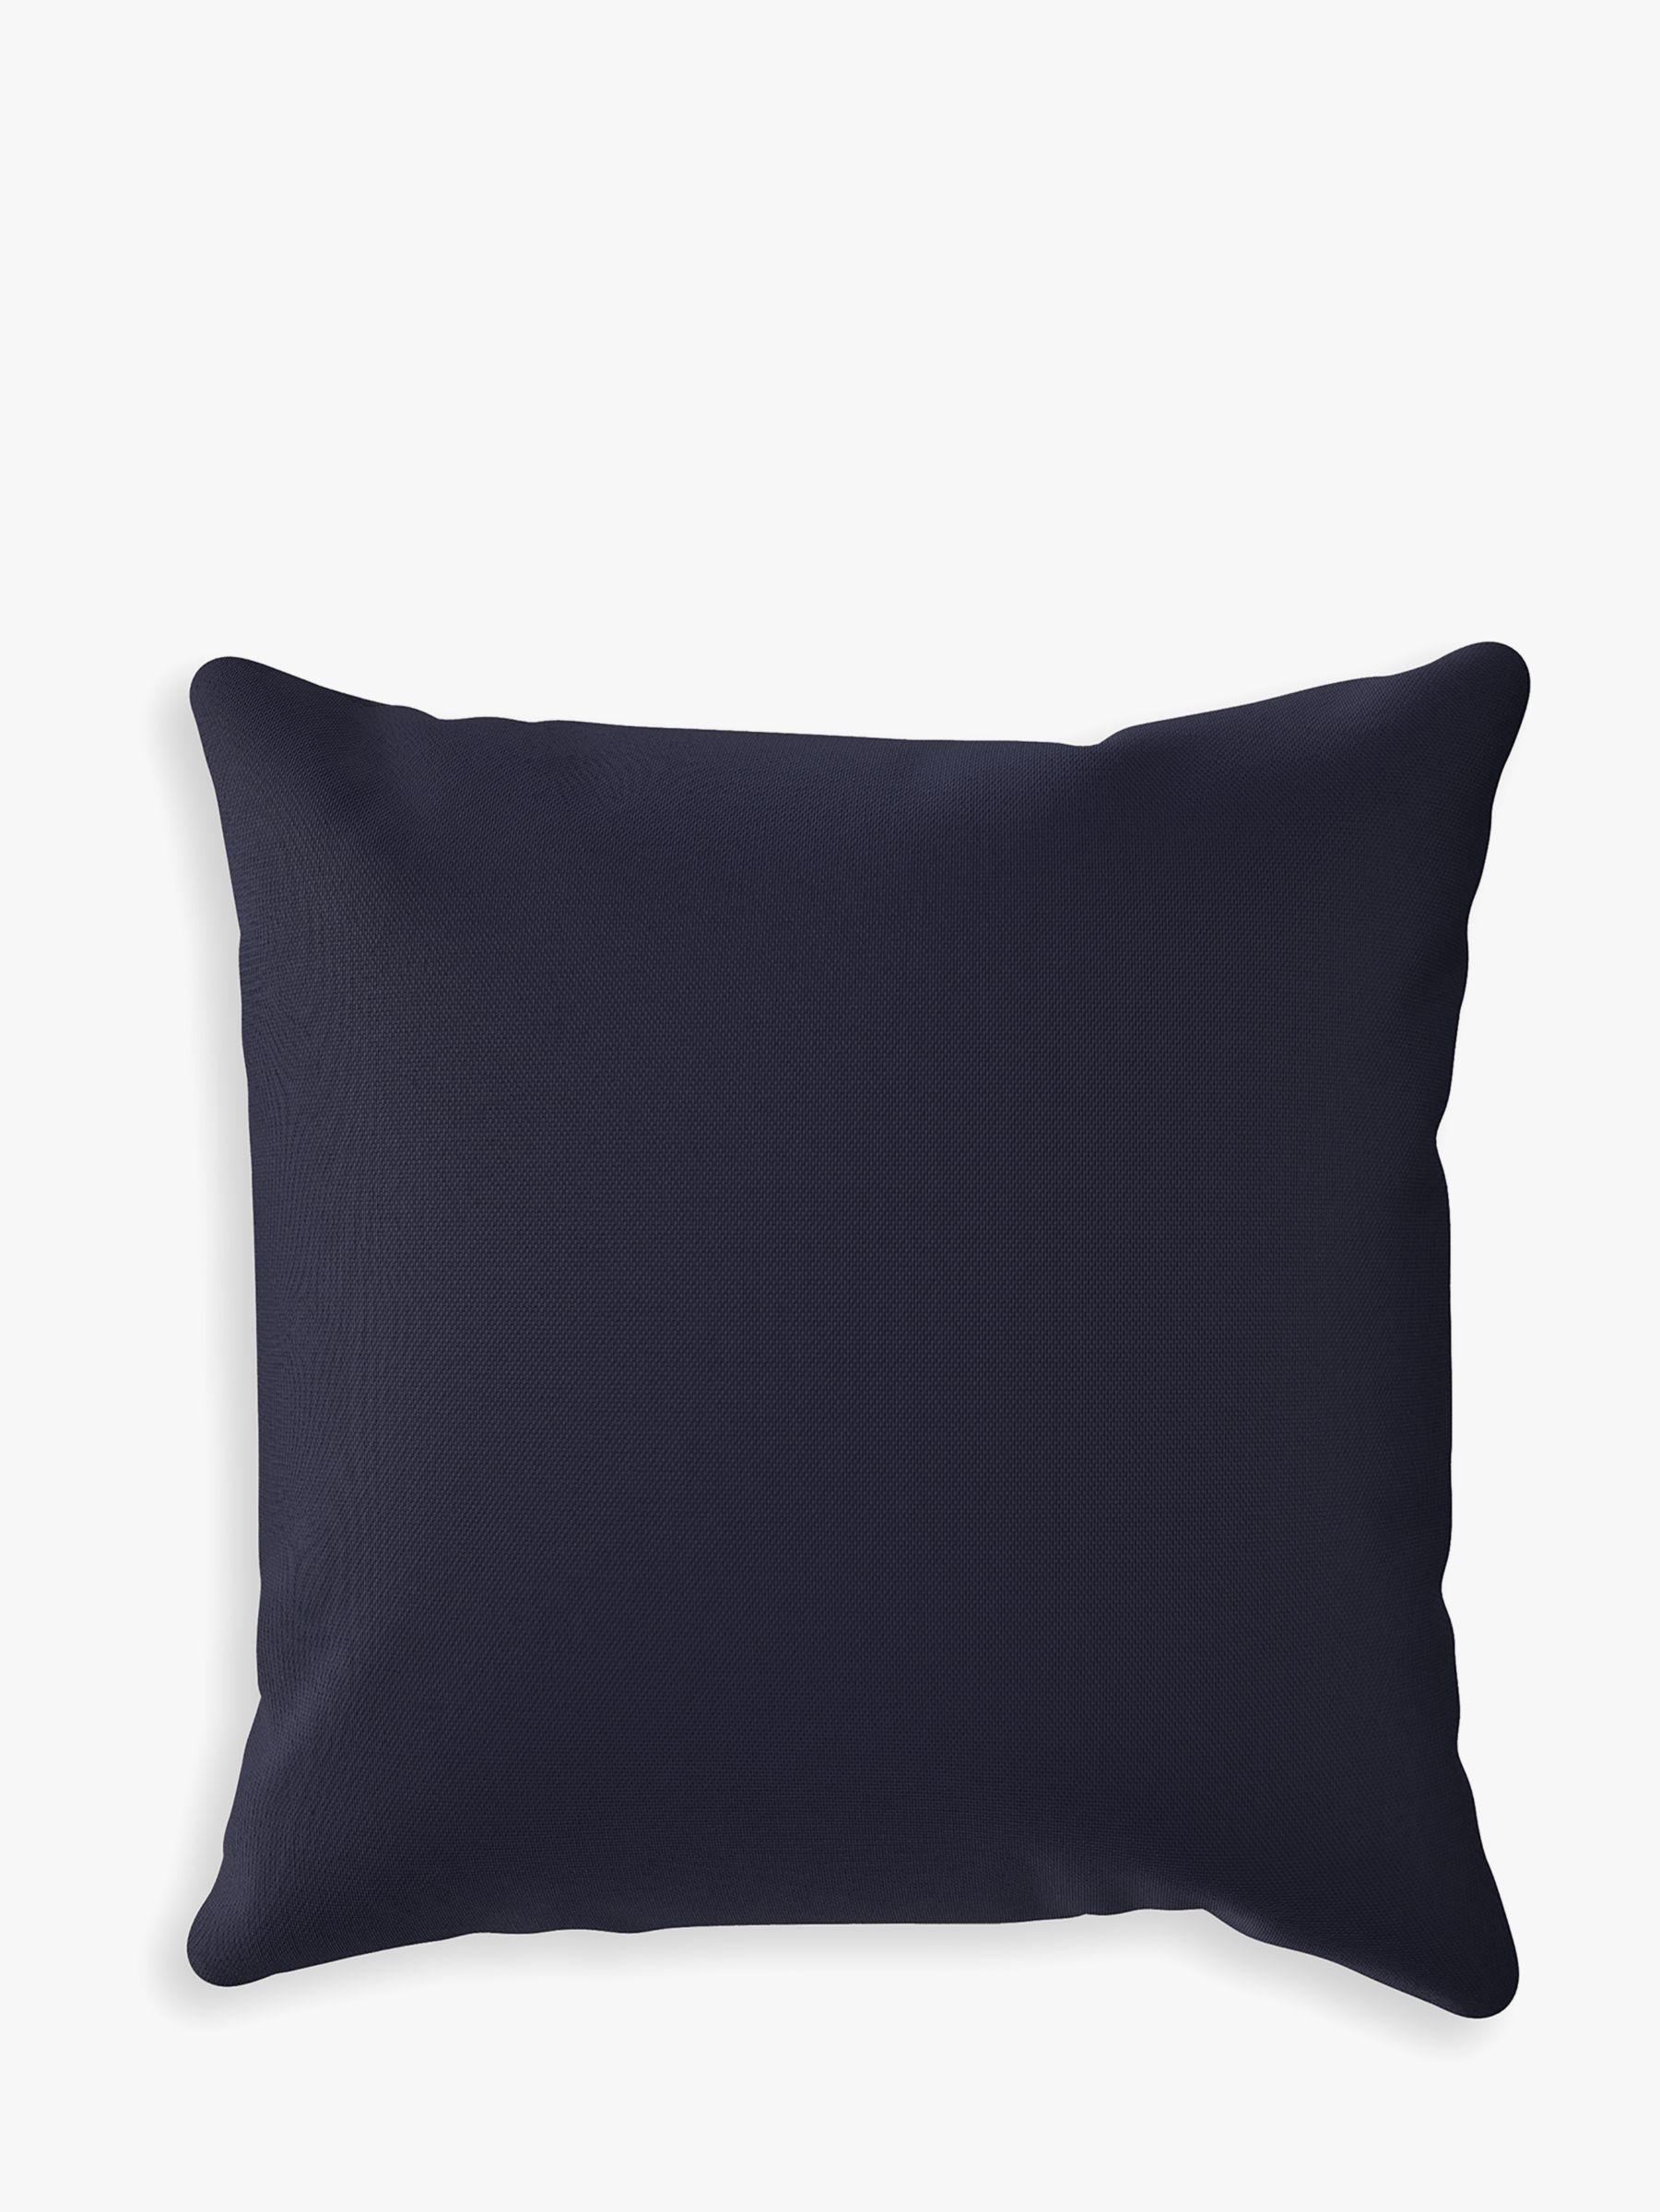 John Lewis & Partners Plain Garden Cushion, 43 x 43cm